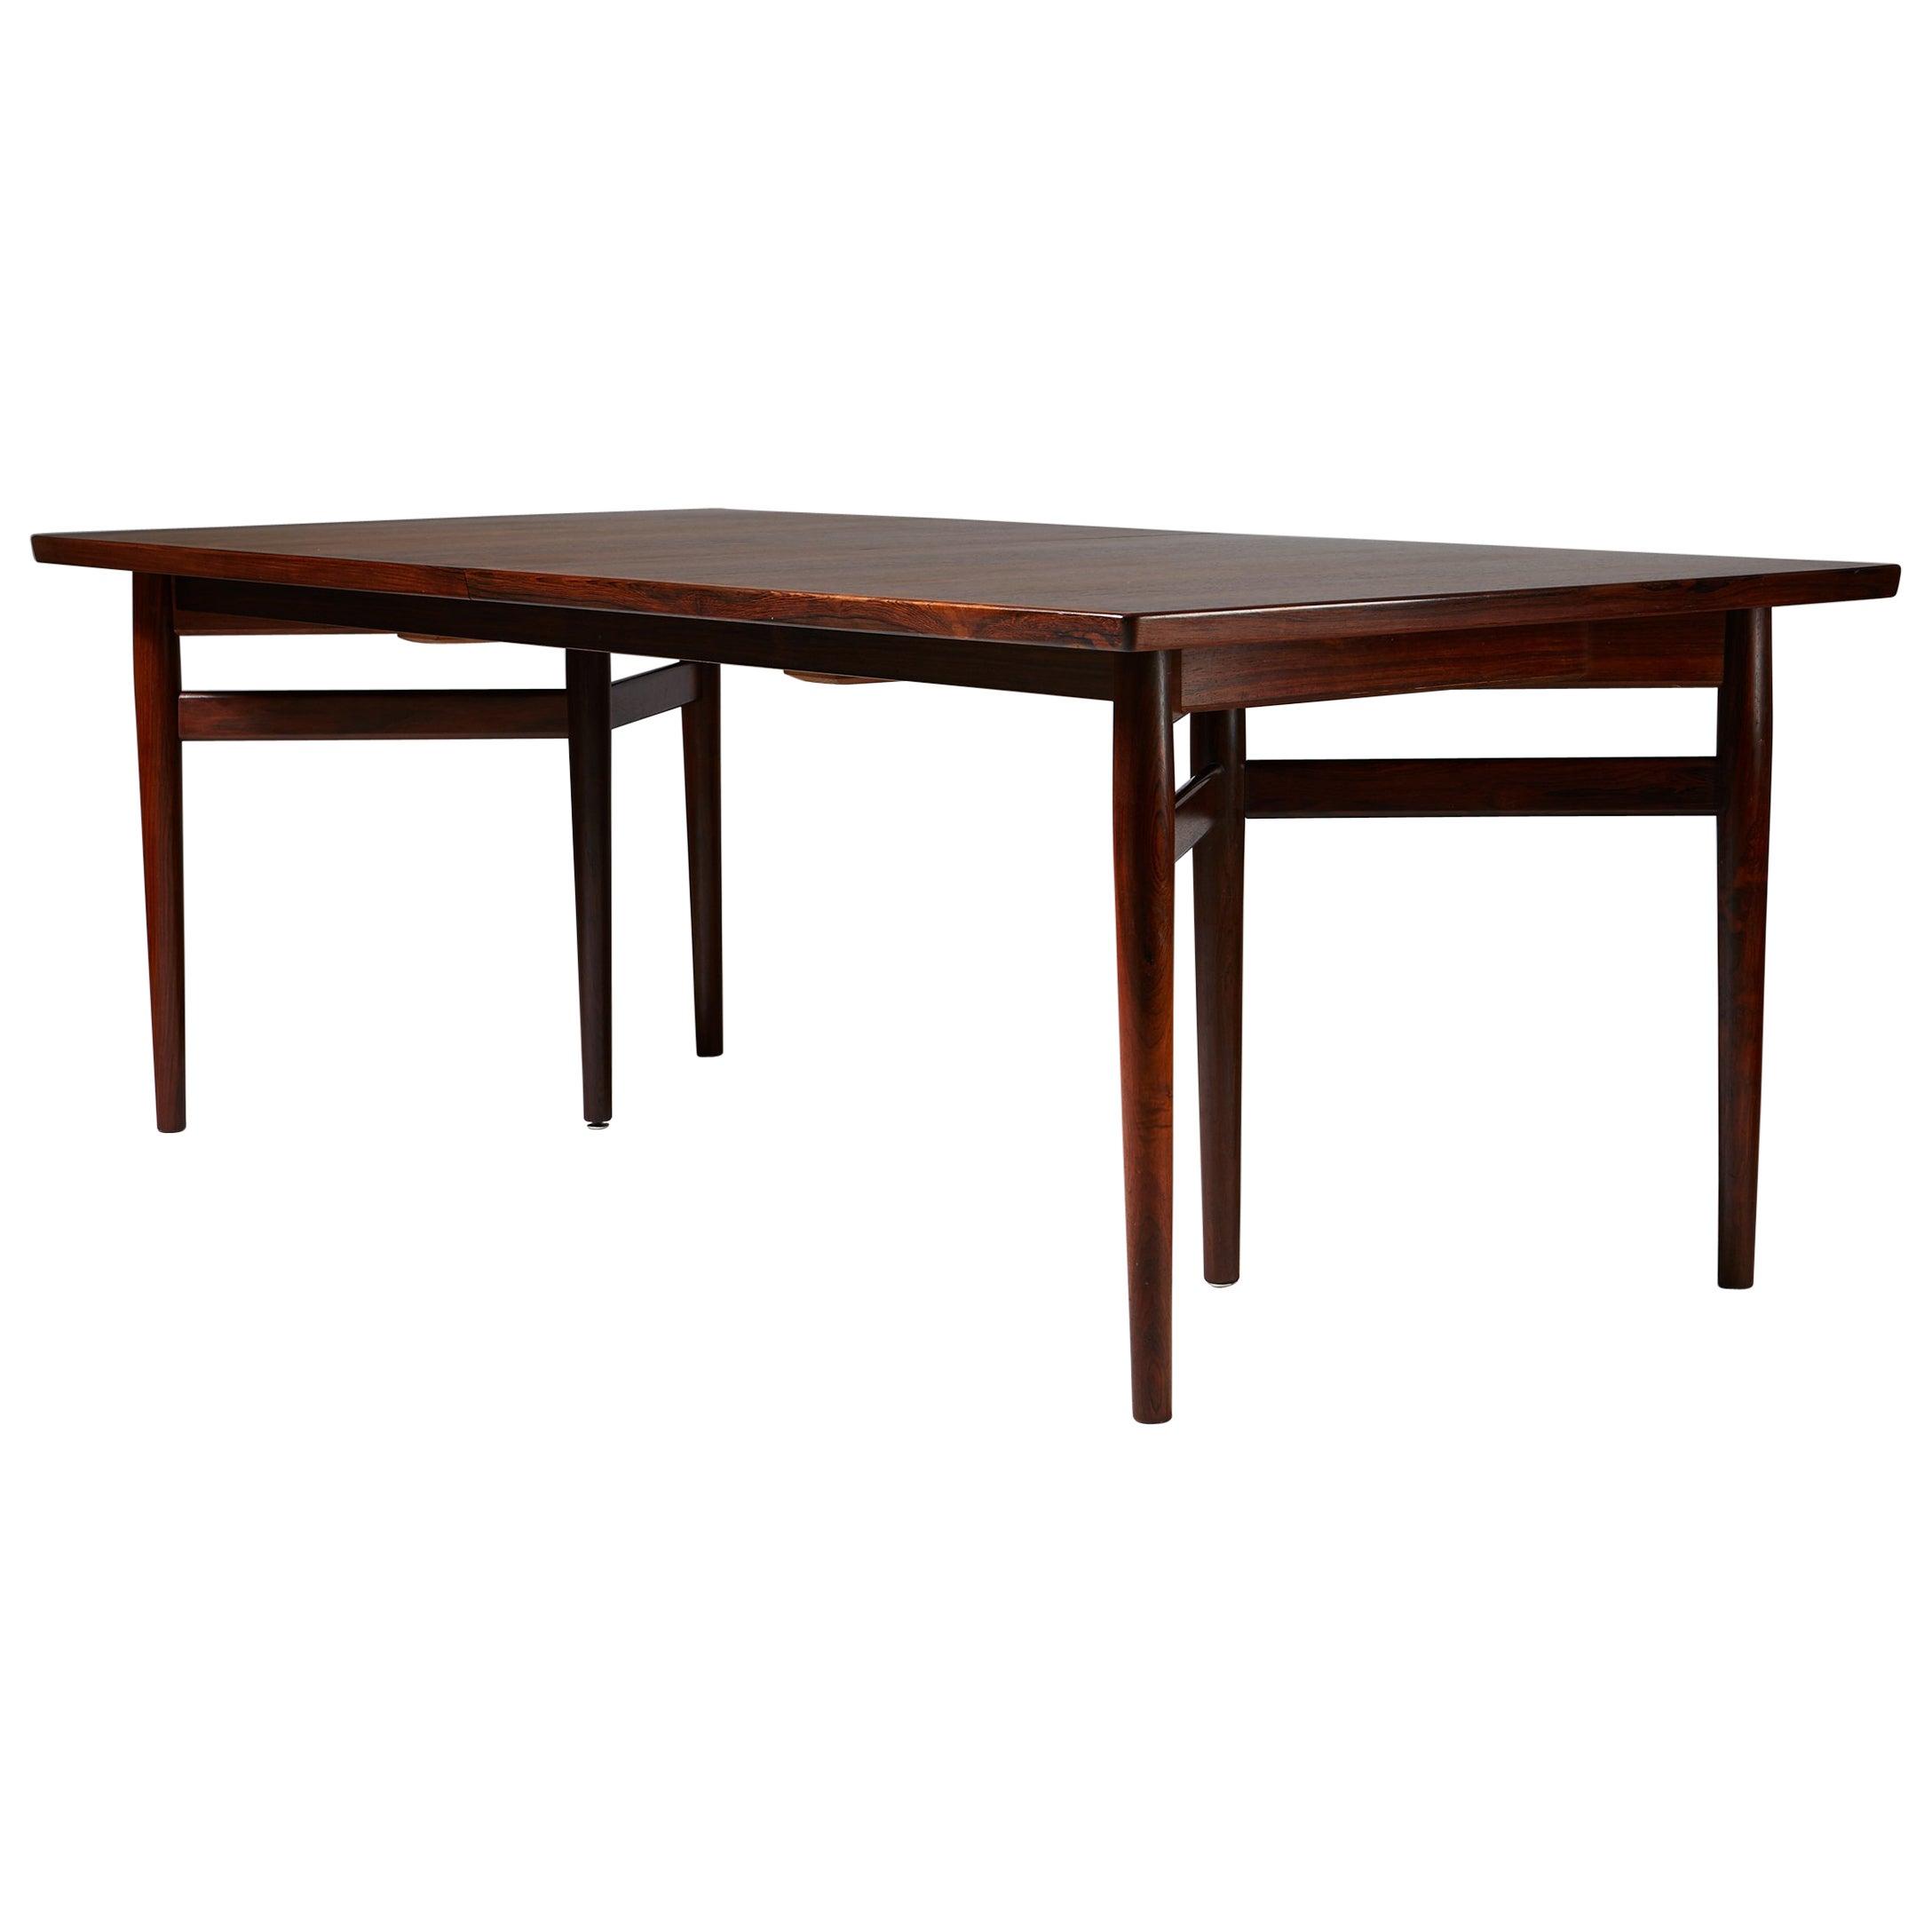 Dining Table Designed by Arne Vodder by Sibast, Denmark, 1960s